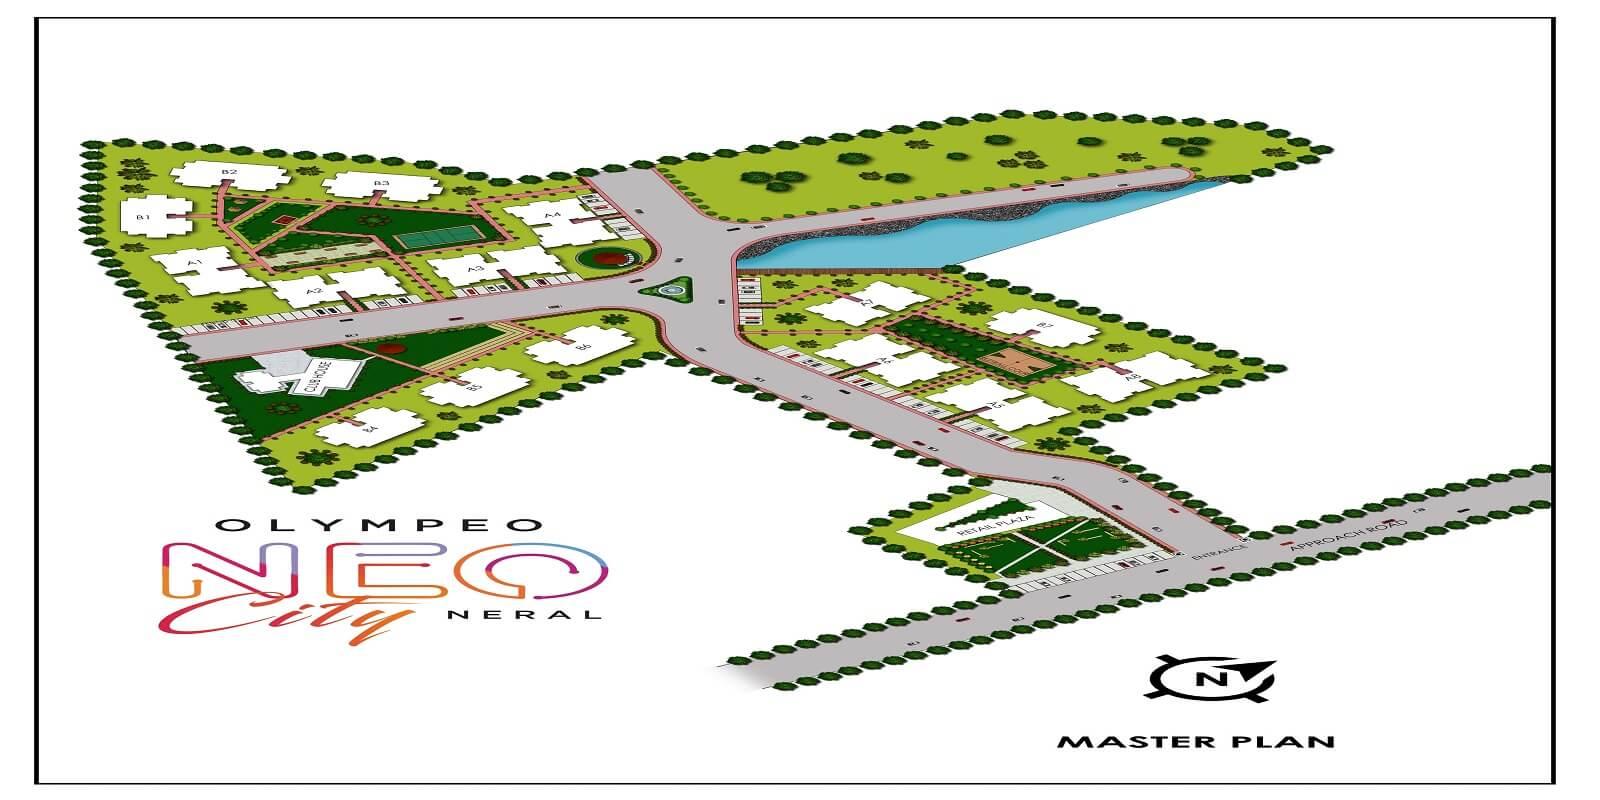 olympeo neo city master plan image1